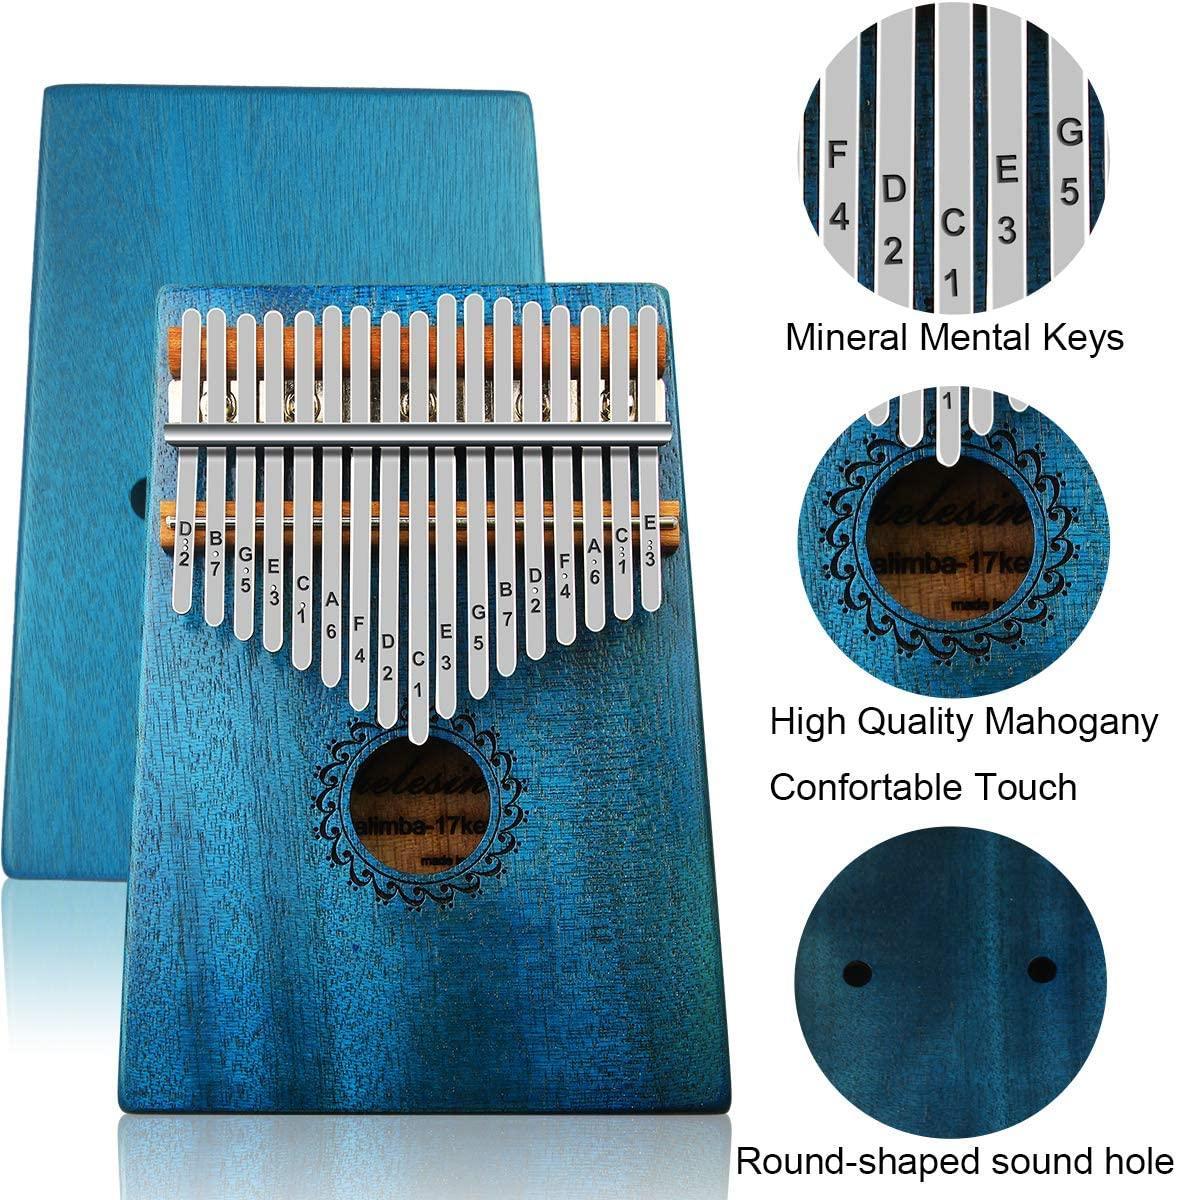 Thumb Piano Waterproof Protective Crystal Discoloration 17 Key Wholesale Beginner Portable Keys Mini Kalimba 3 buyers